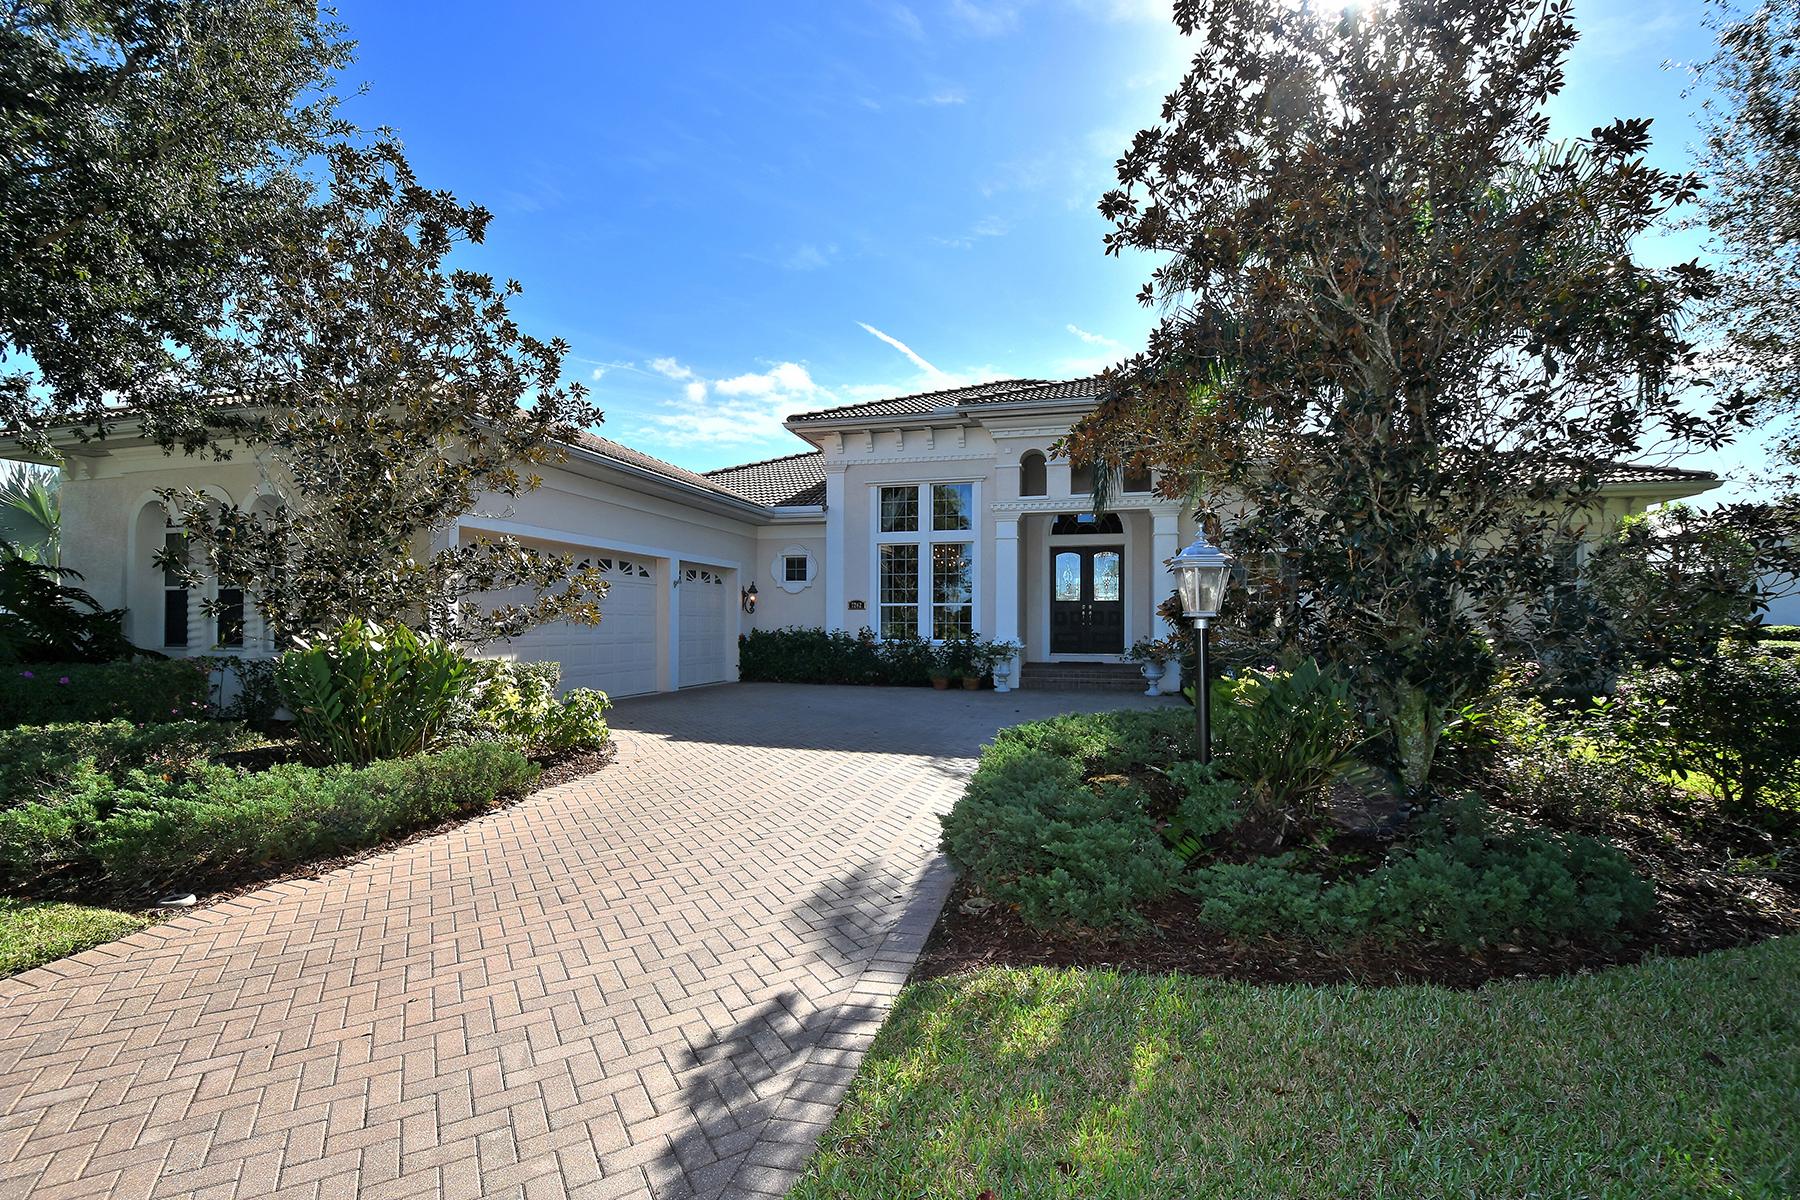 Single Family Home for Sale at Lakewood Ranch 7202 Ashland Lakewood Ranch, Florida 34202 United States